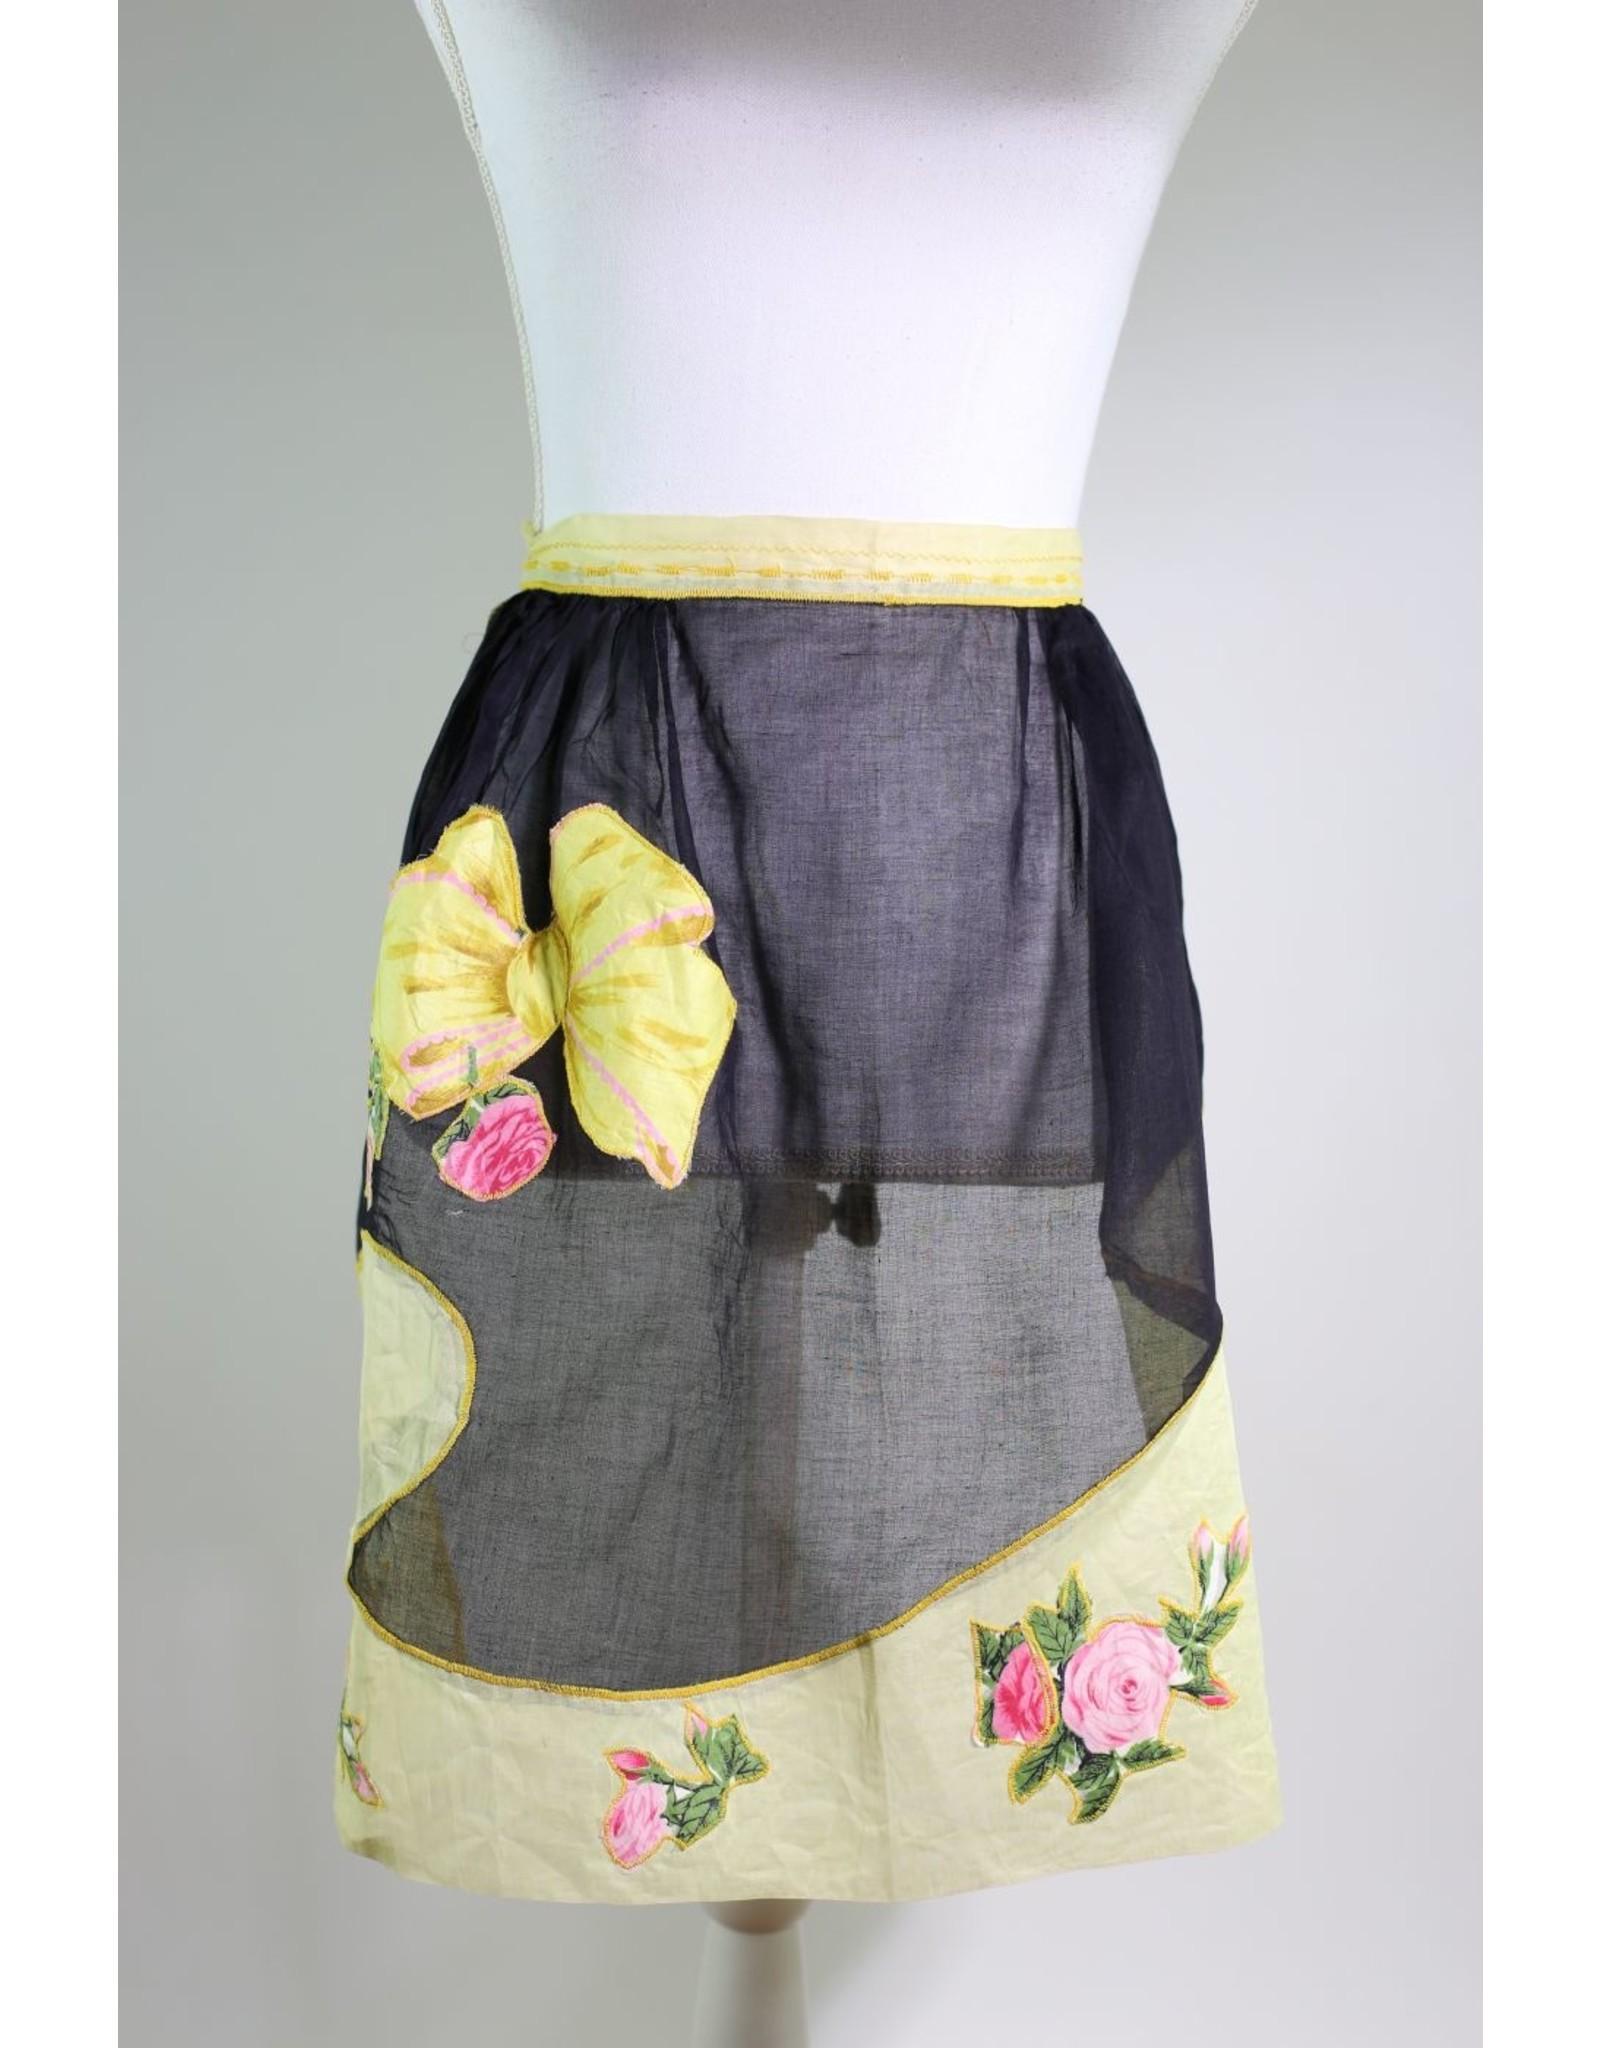 1950's Black & Yellow Apron w/ Bows & Flowers